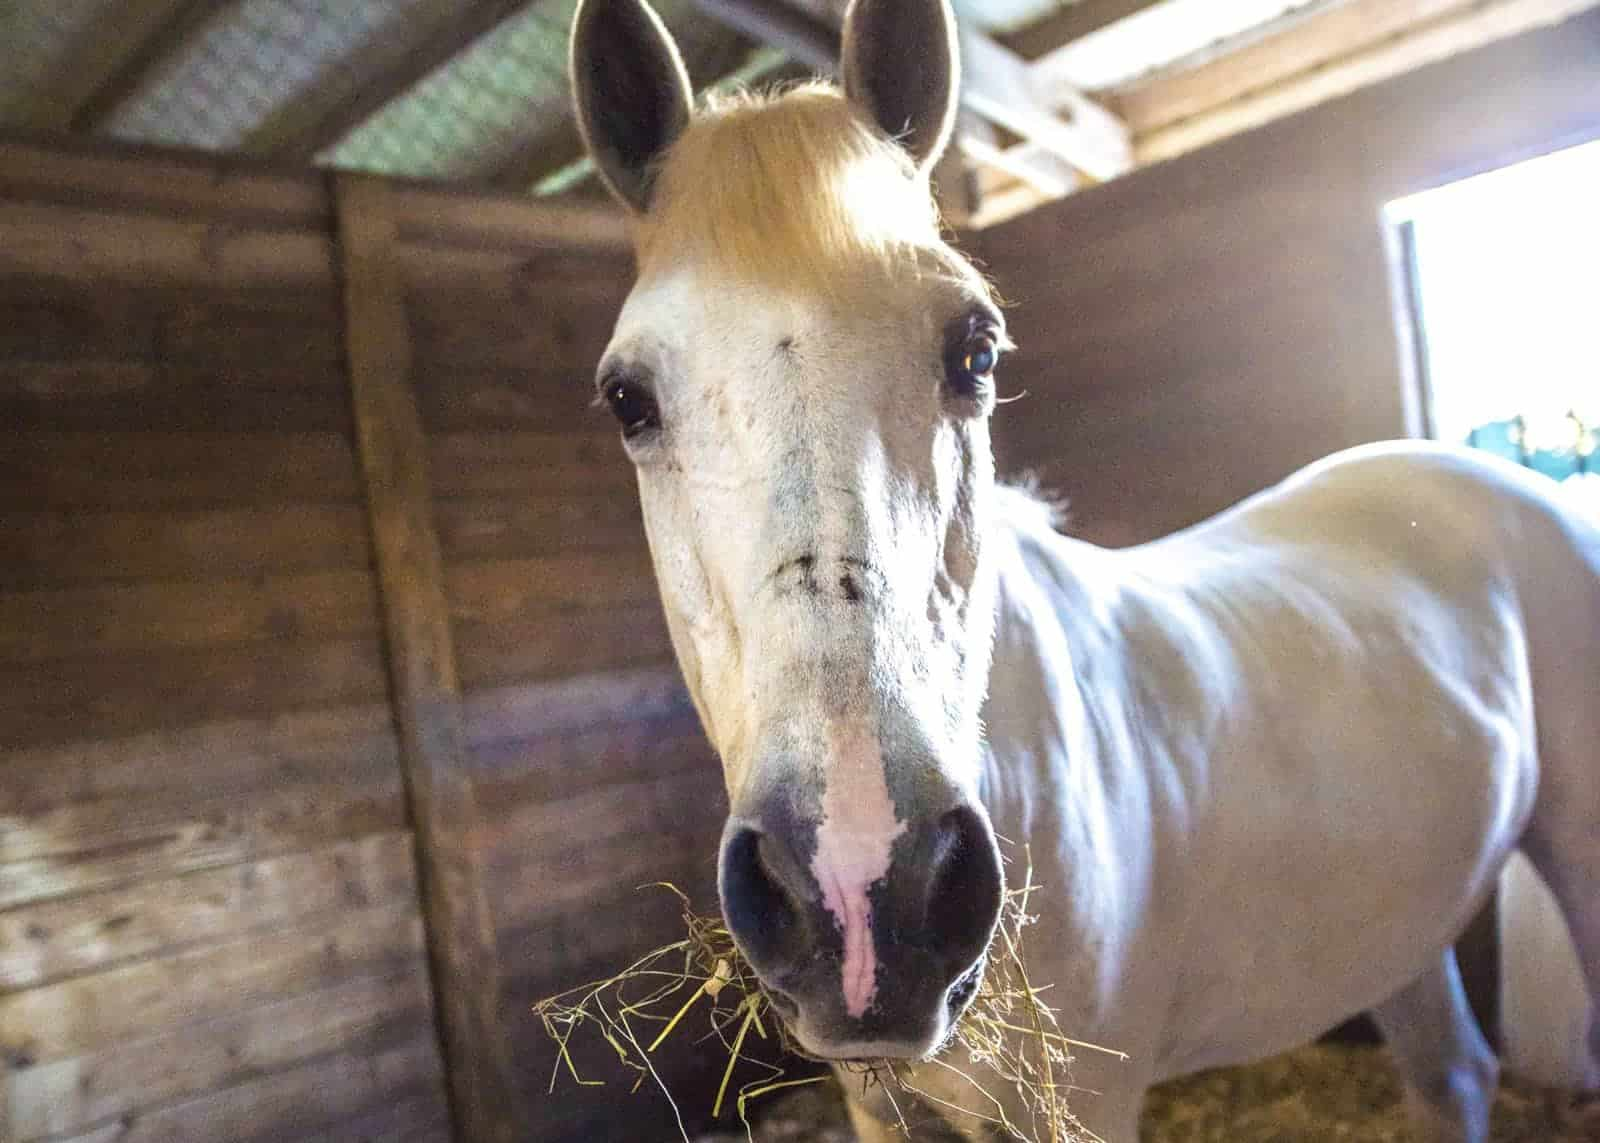 Feeding the Ulcer-Prone Horse